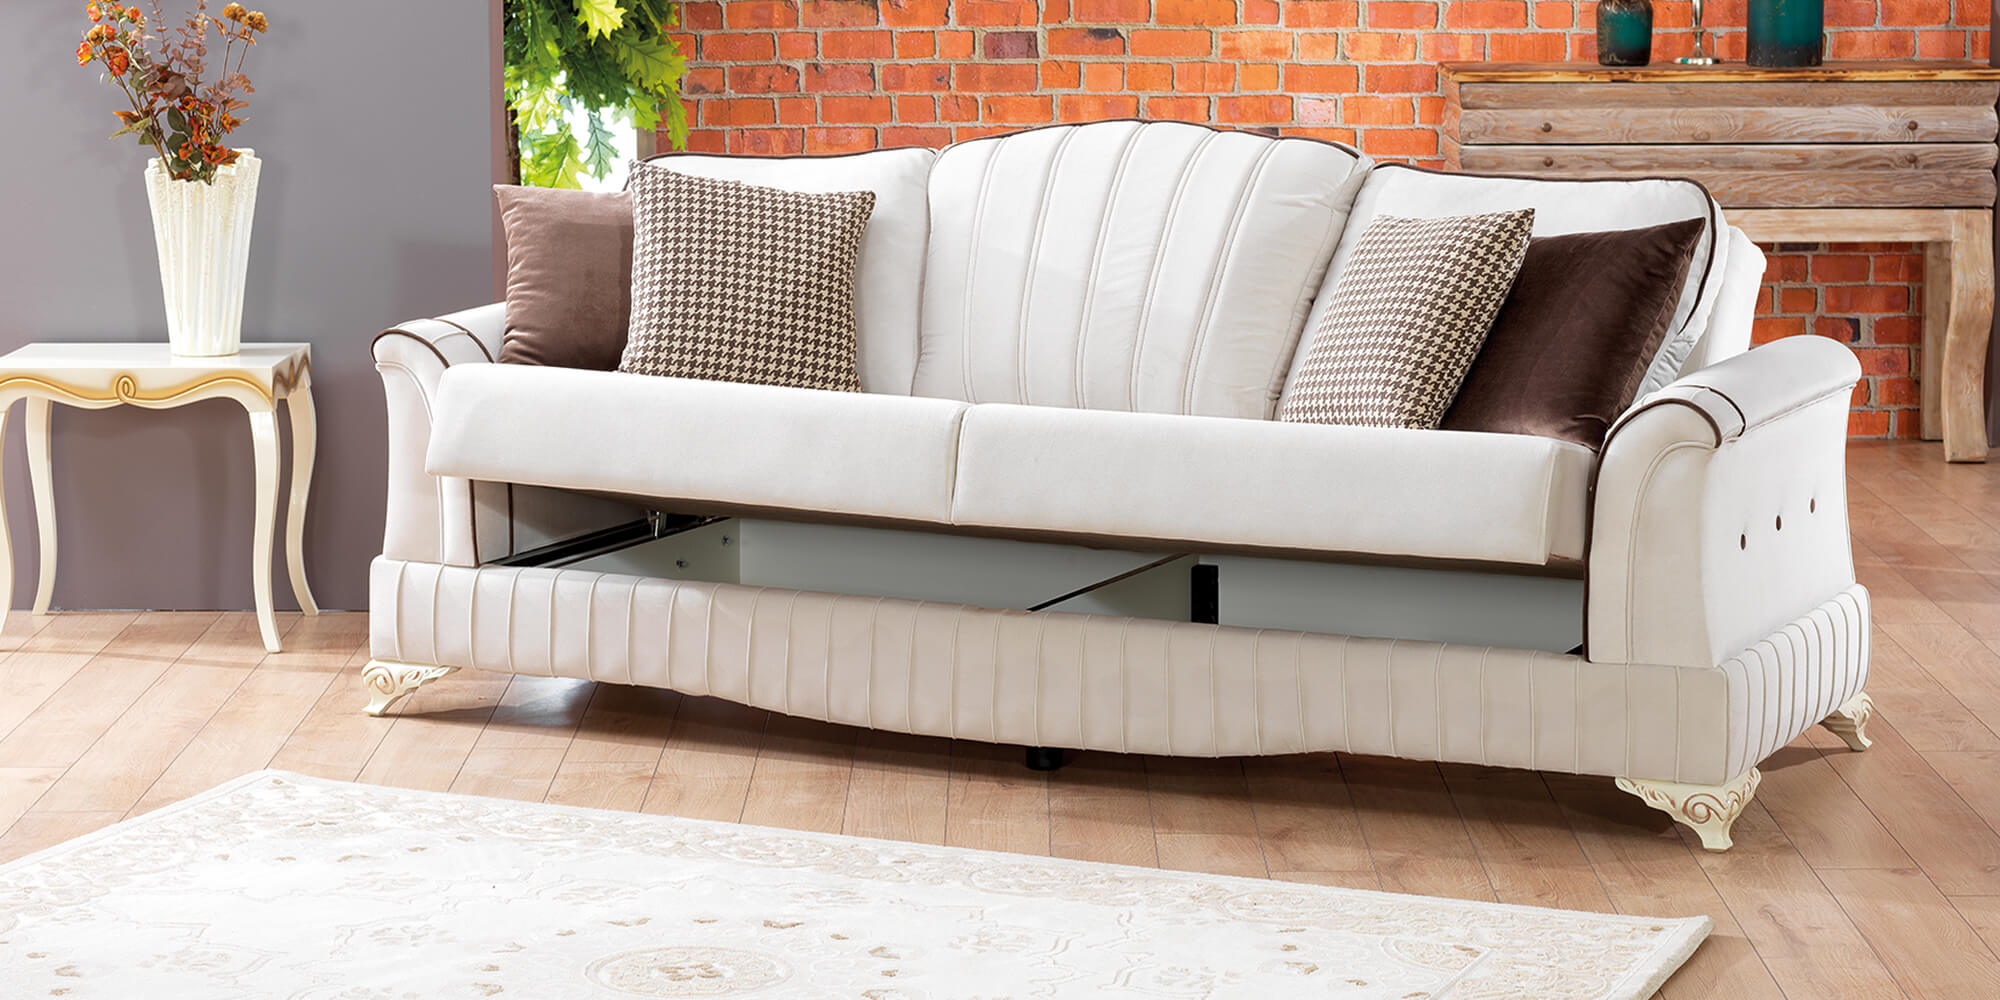 city 3 2 1 delux sofa set yuvam m belhaus in wuppertal cilek offizieller h ndler in europa. Black Bedroom Furniture Sets. Home Design Ideas